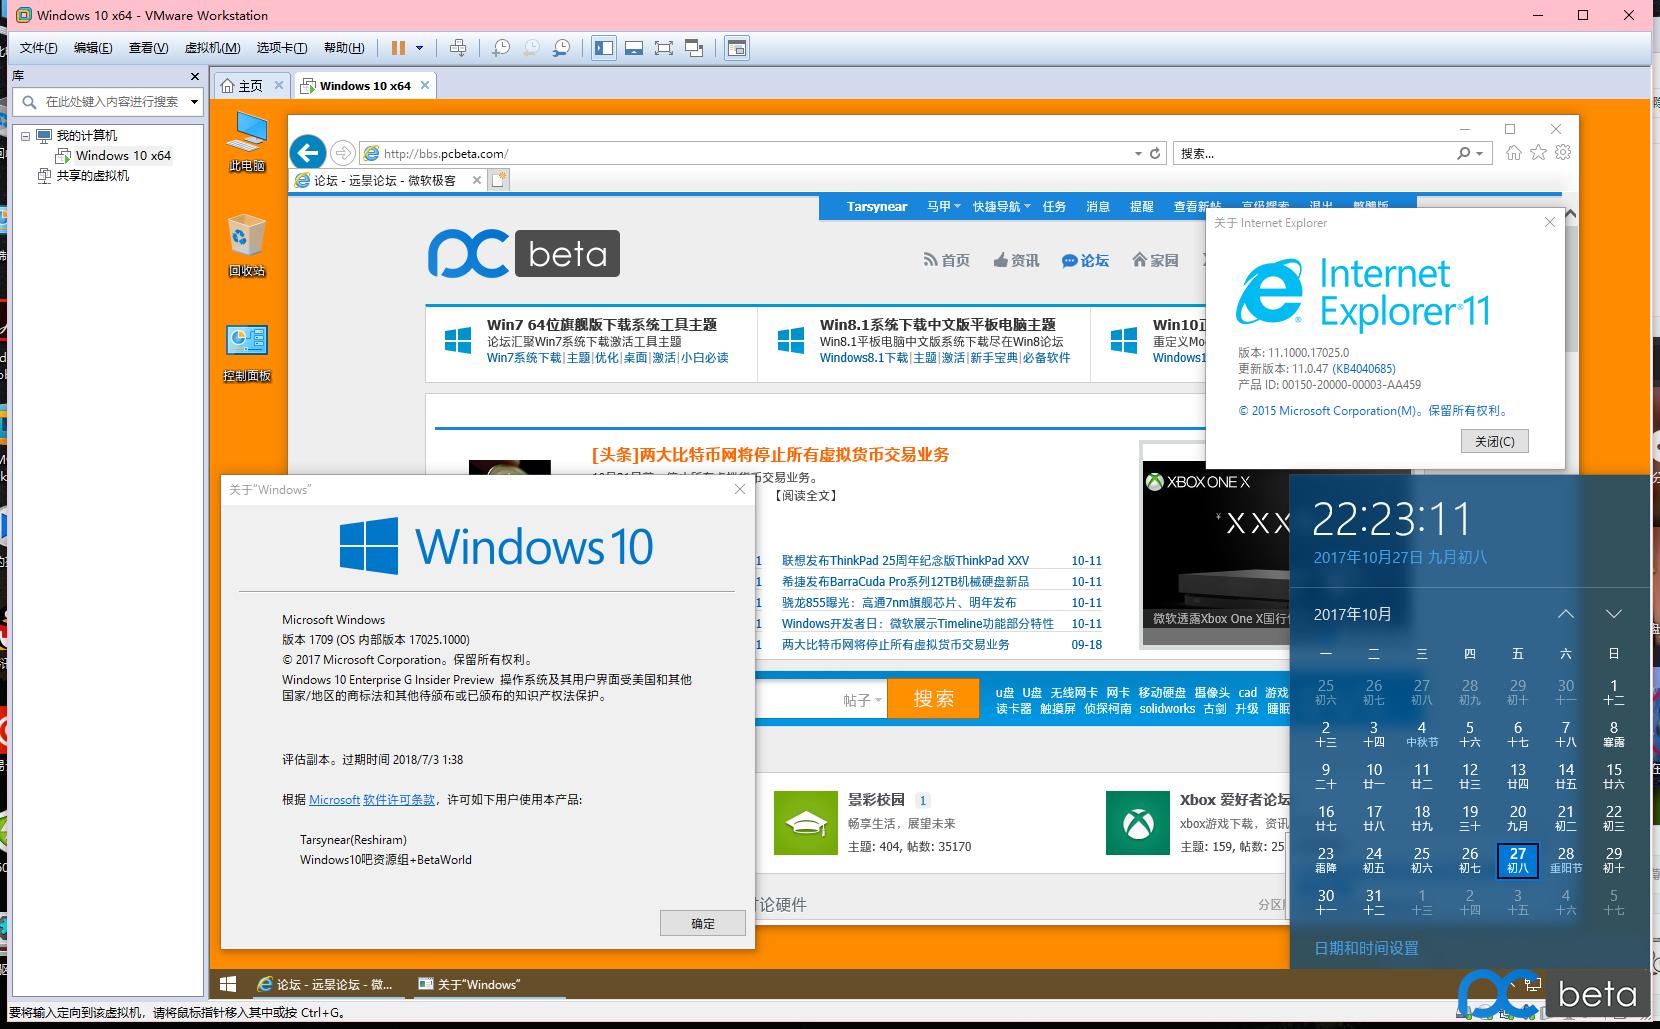 Win10企业版G版64位极限精简版-17025.1000